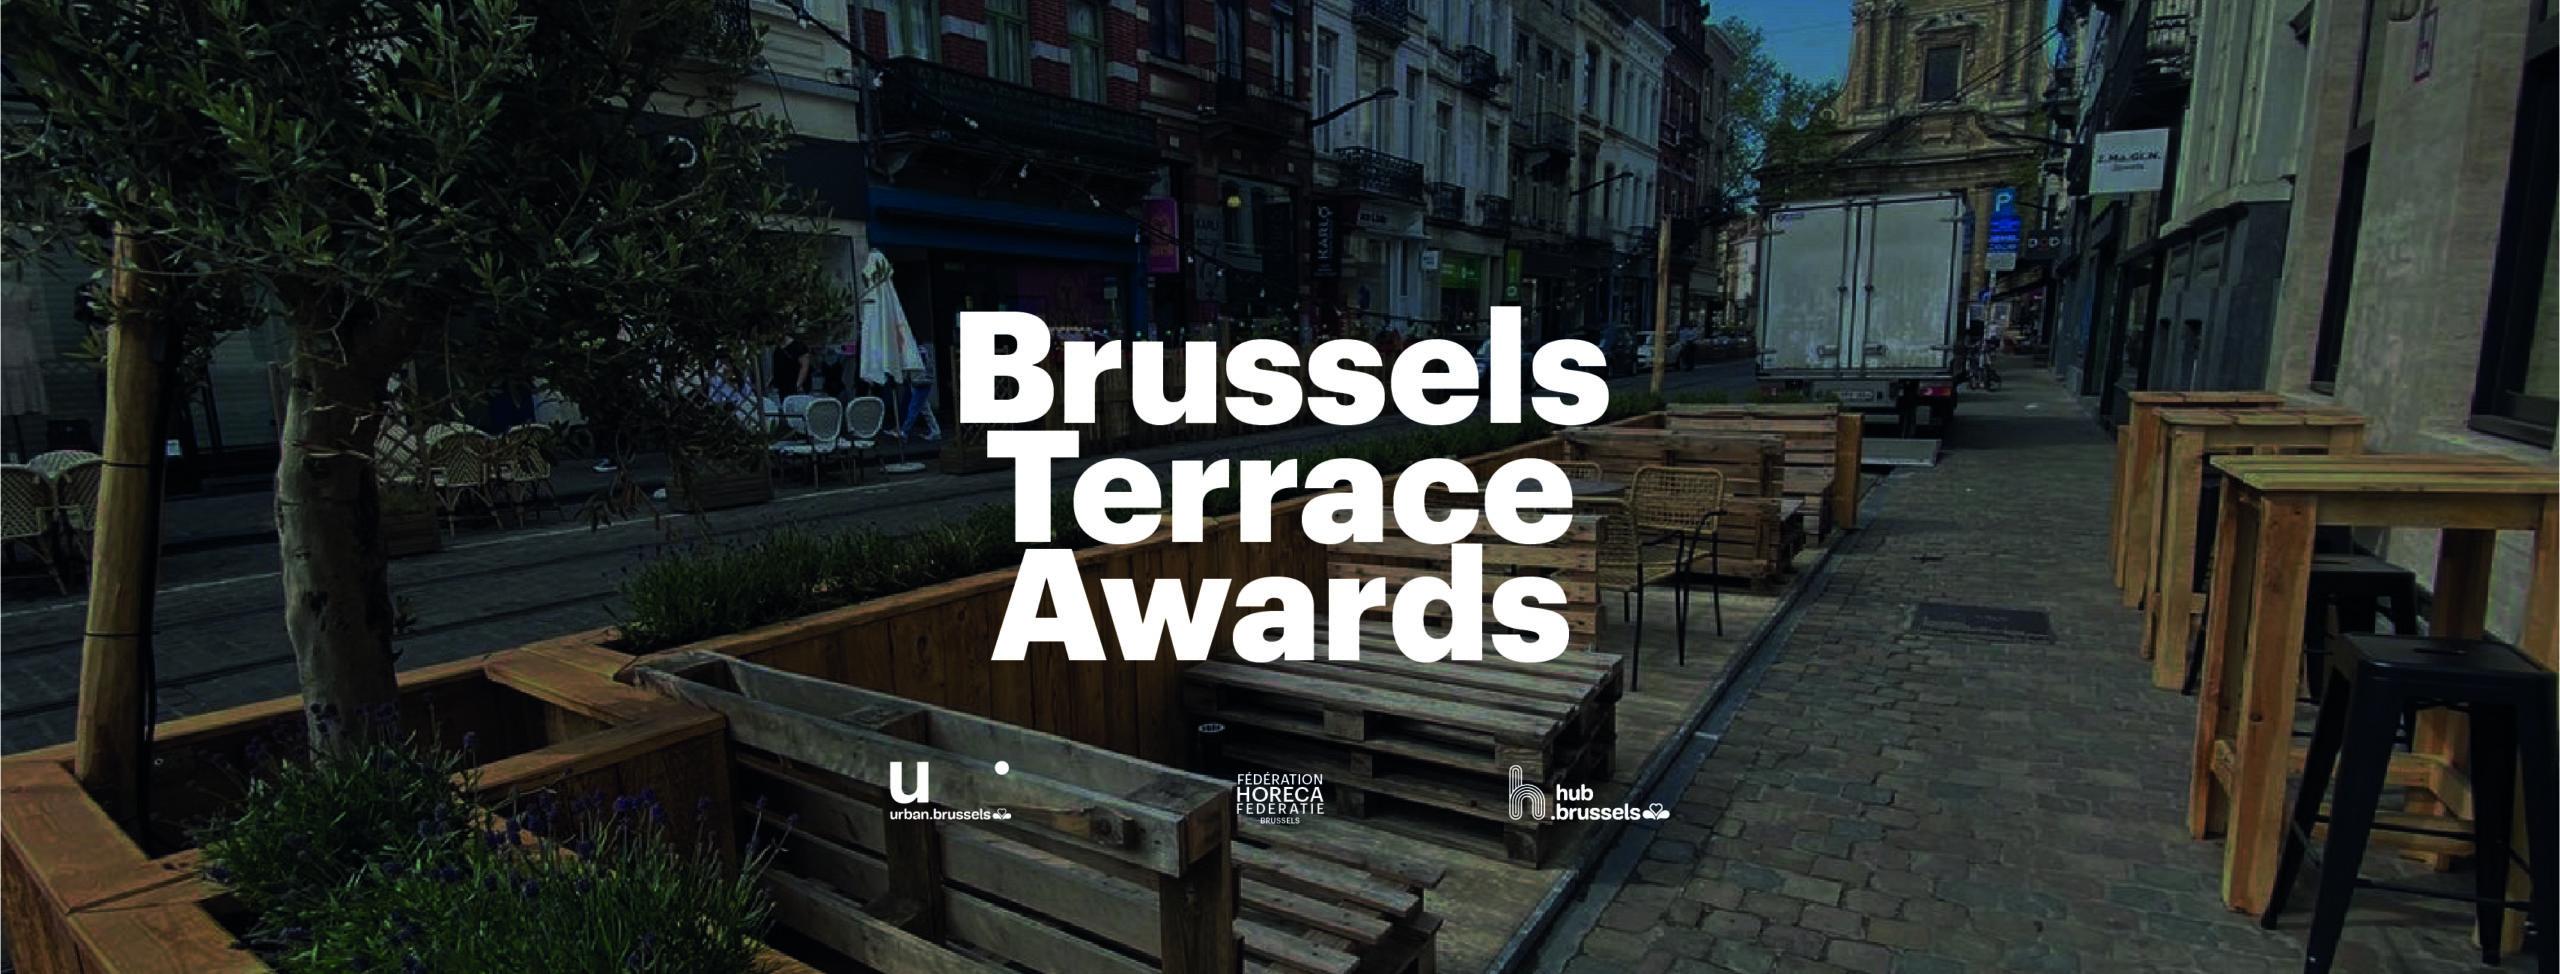 Brussels Terrace Awards-banner